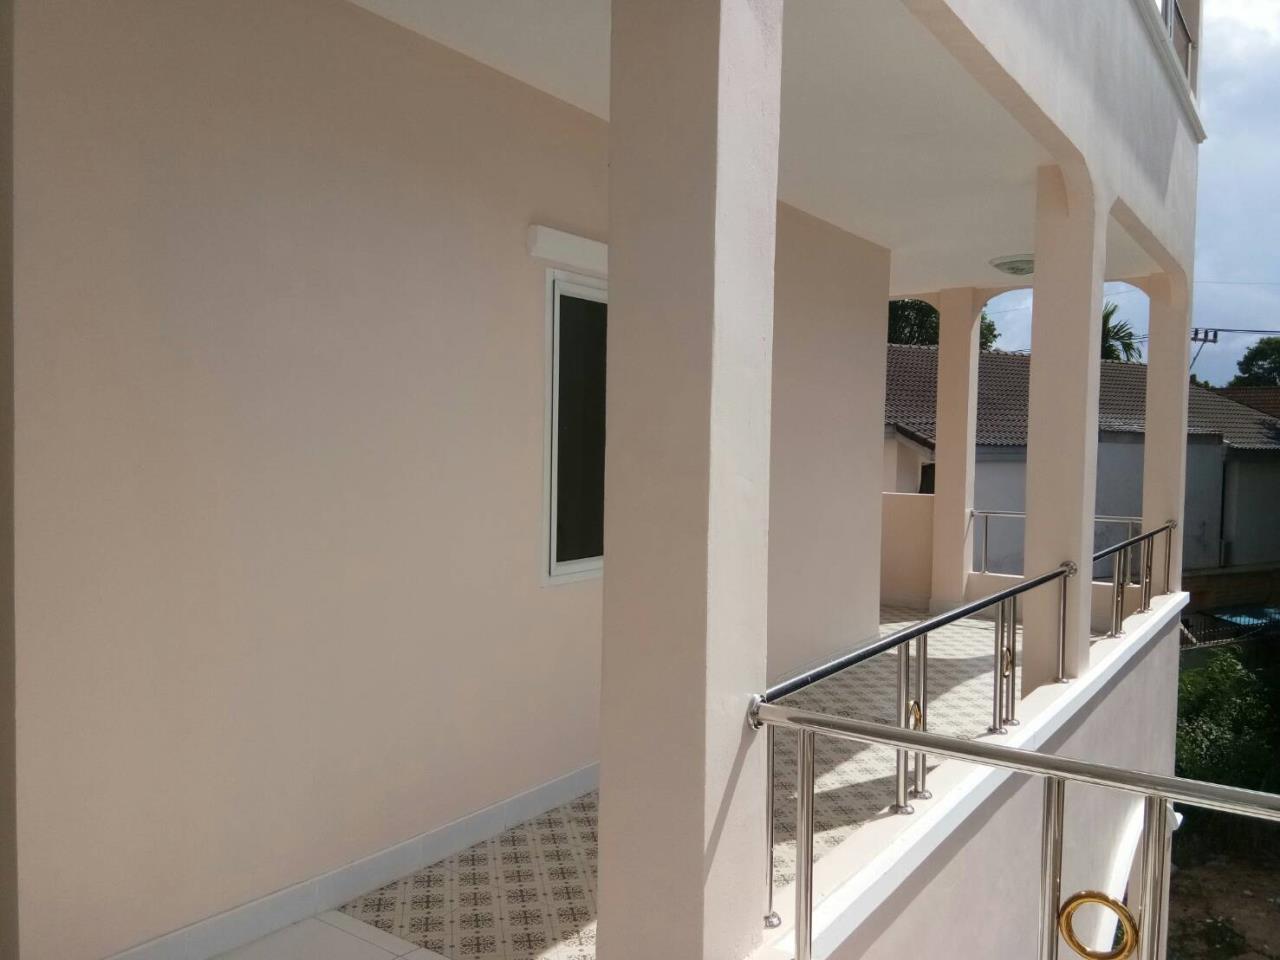 Agent - Thammajak Agency's Sale building 3 floors Pattaya Nakluea 16 Alley, near Wongamat beach Pattaya 12